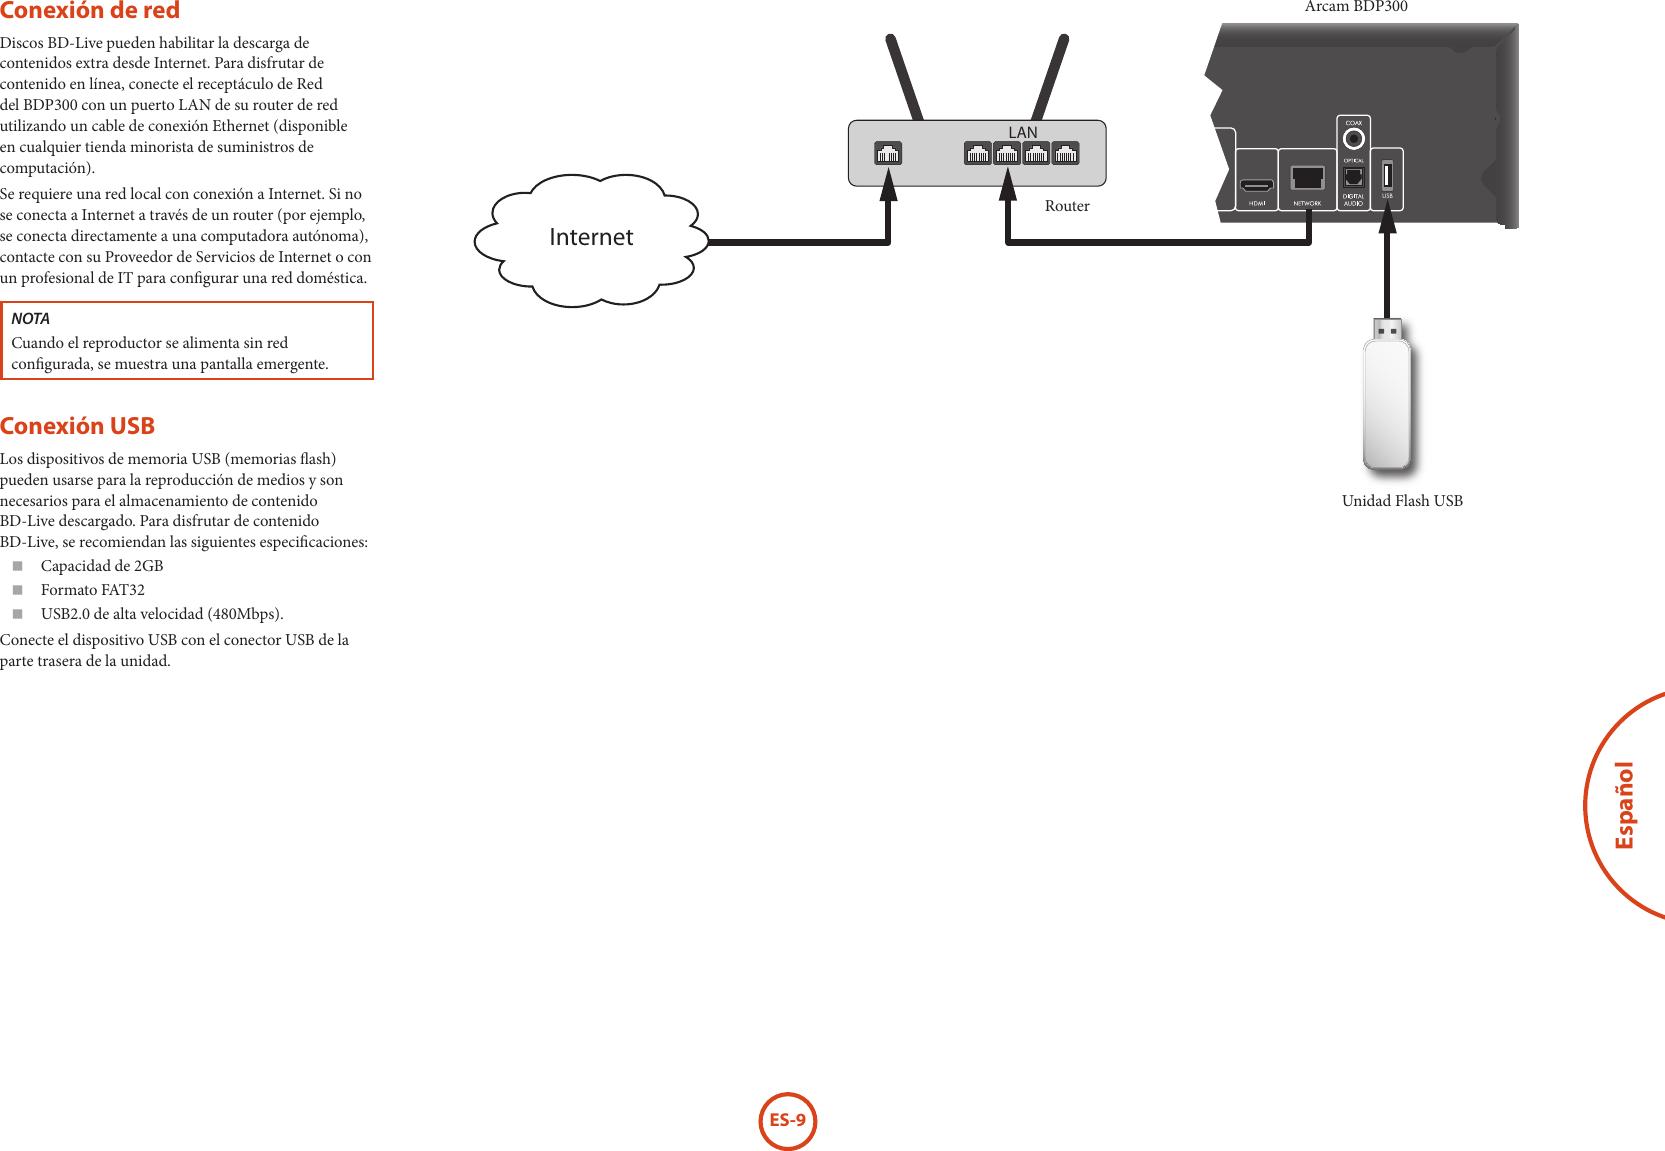 Arcam Bdp300 Users Manual